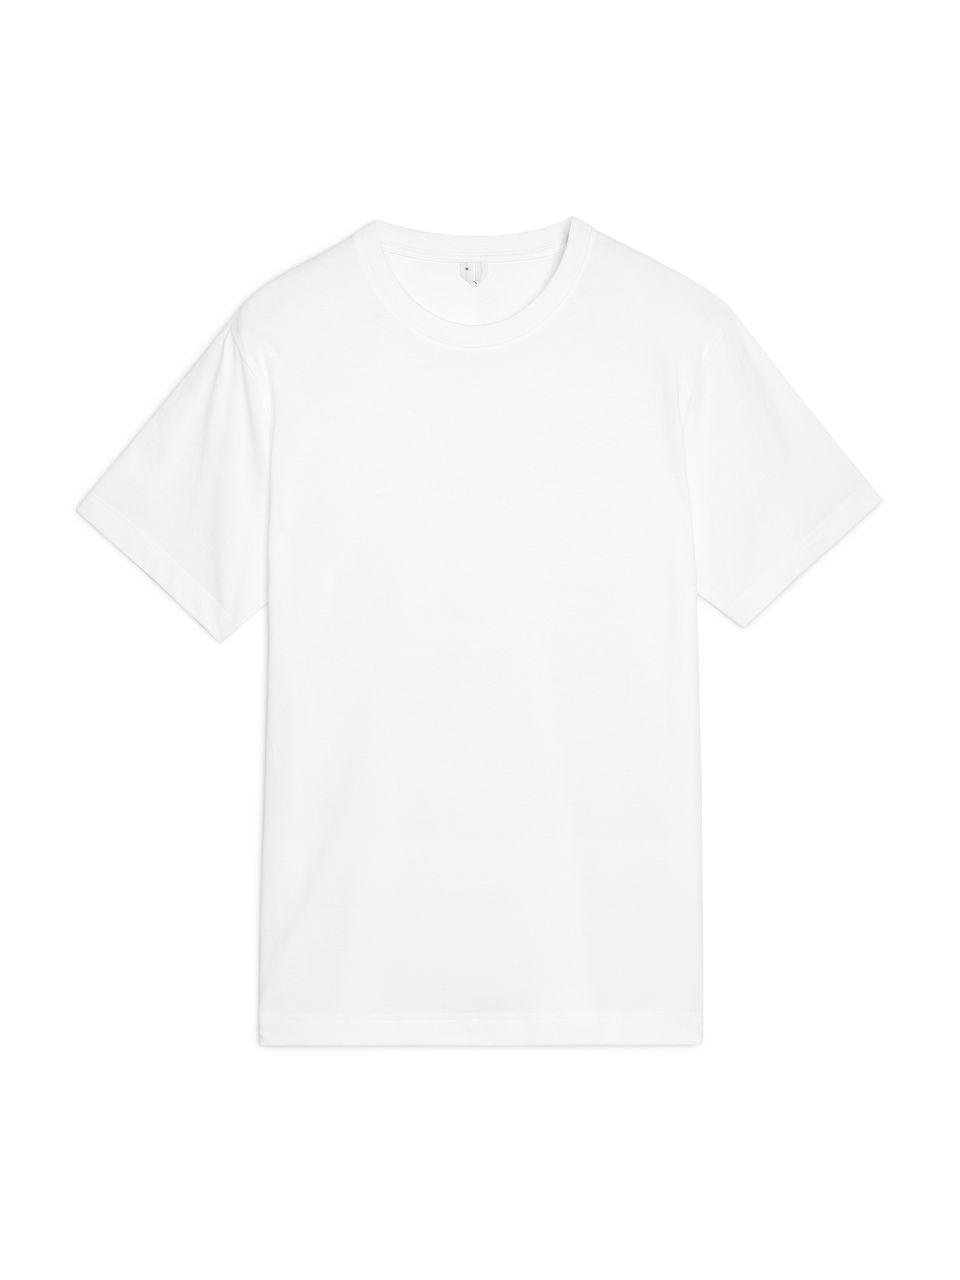 Midweight T-Shirt - White